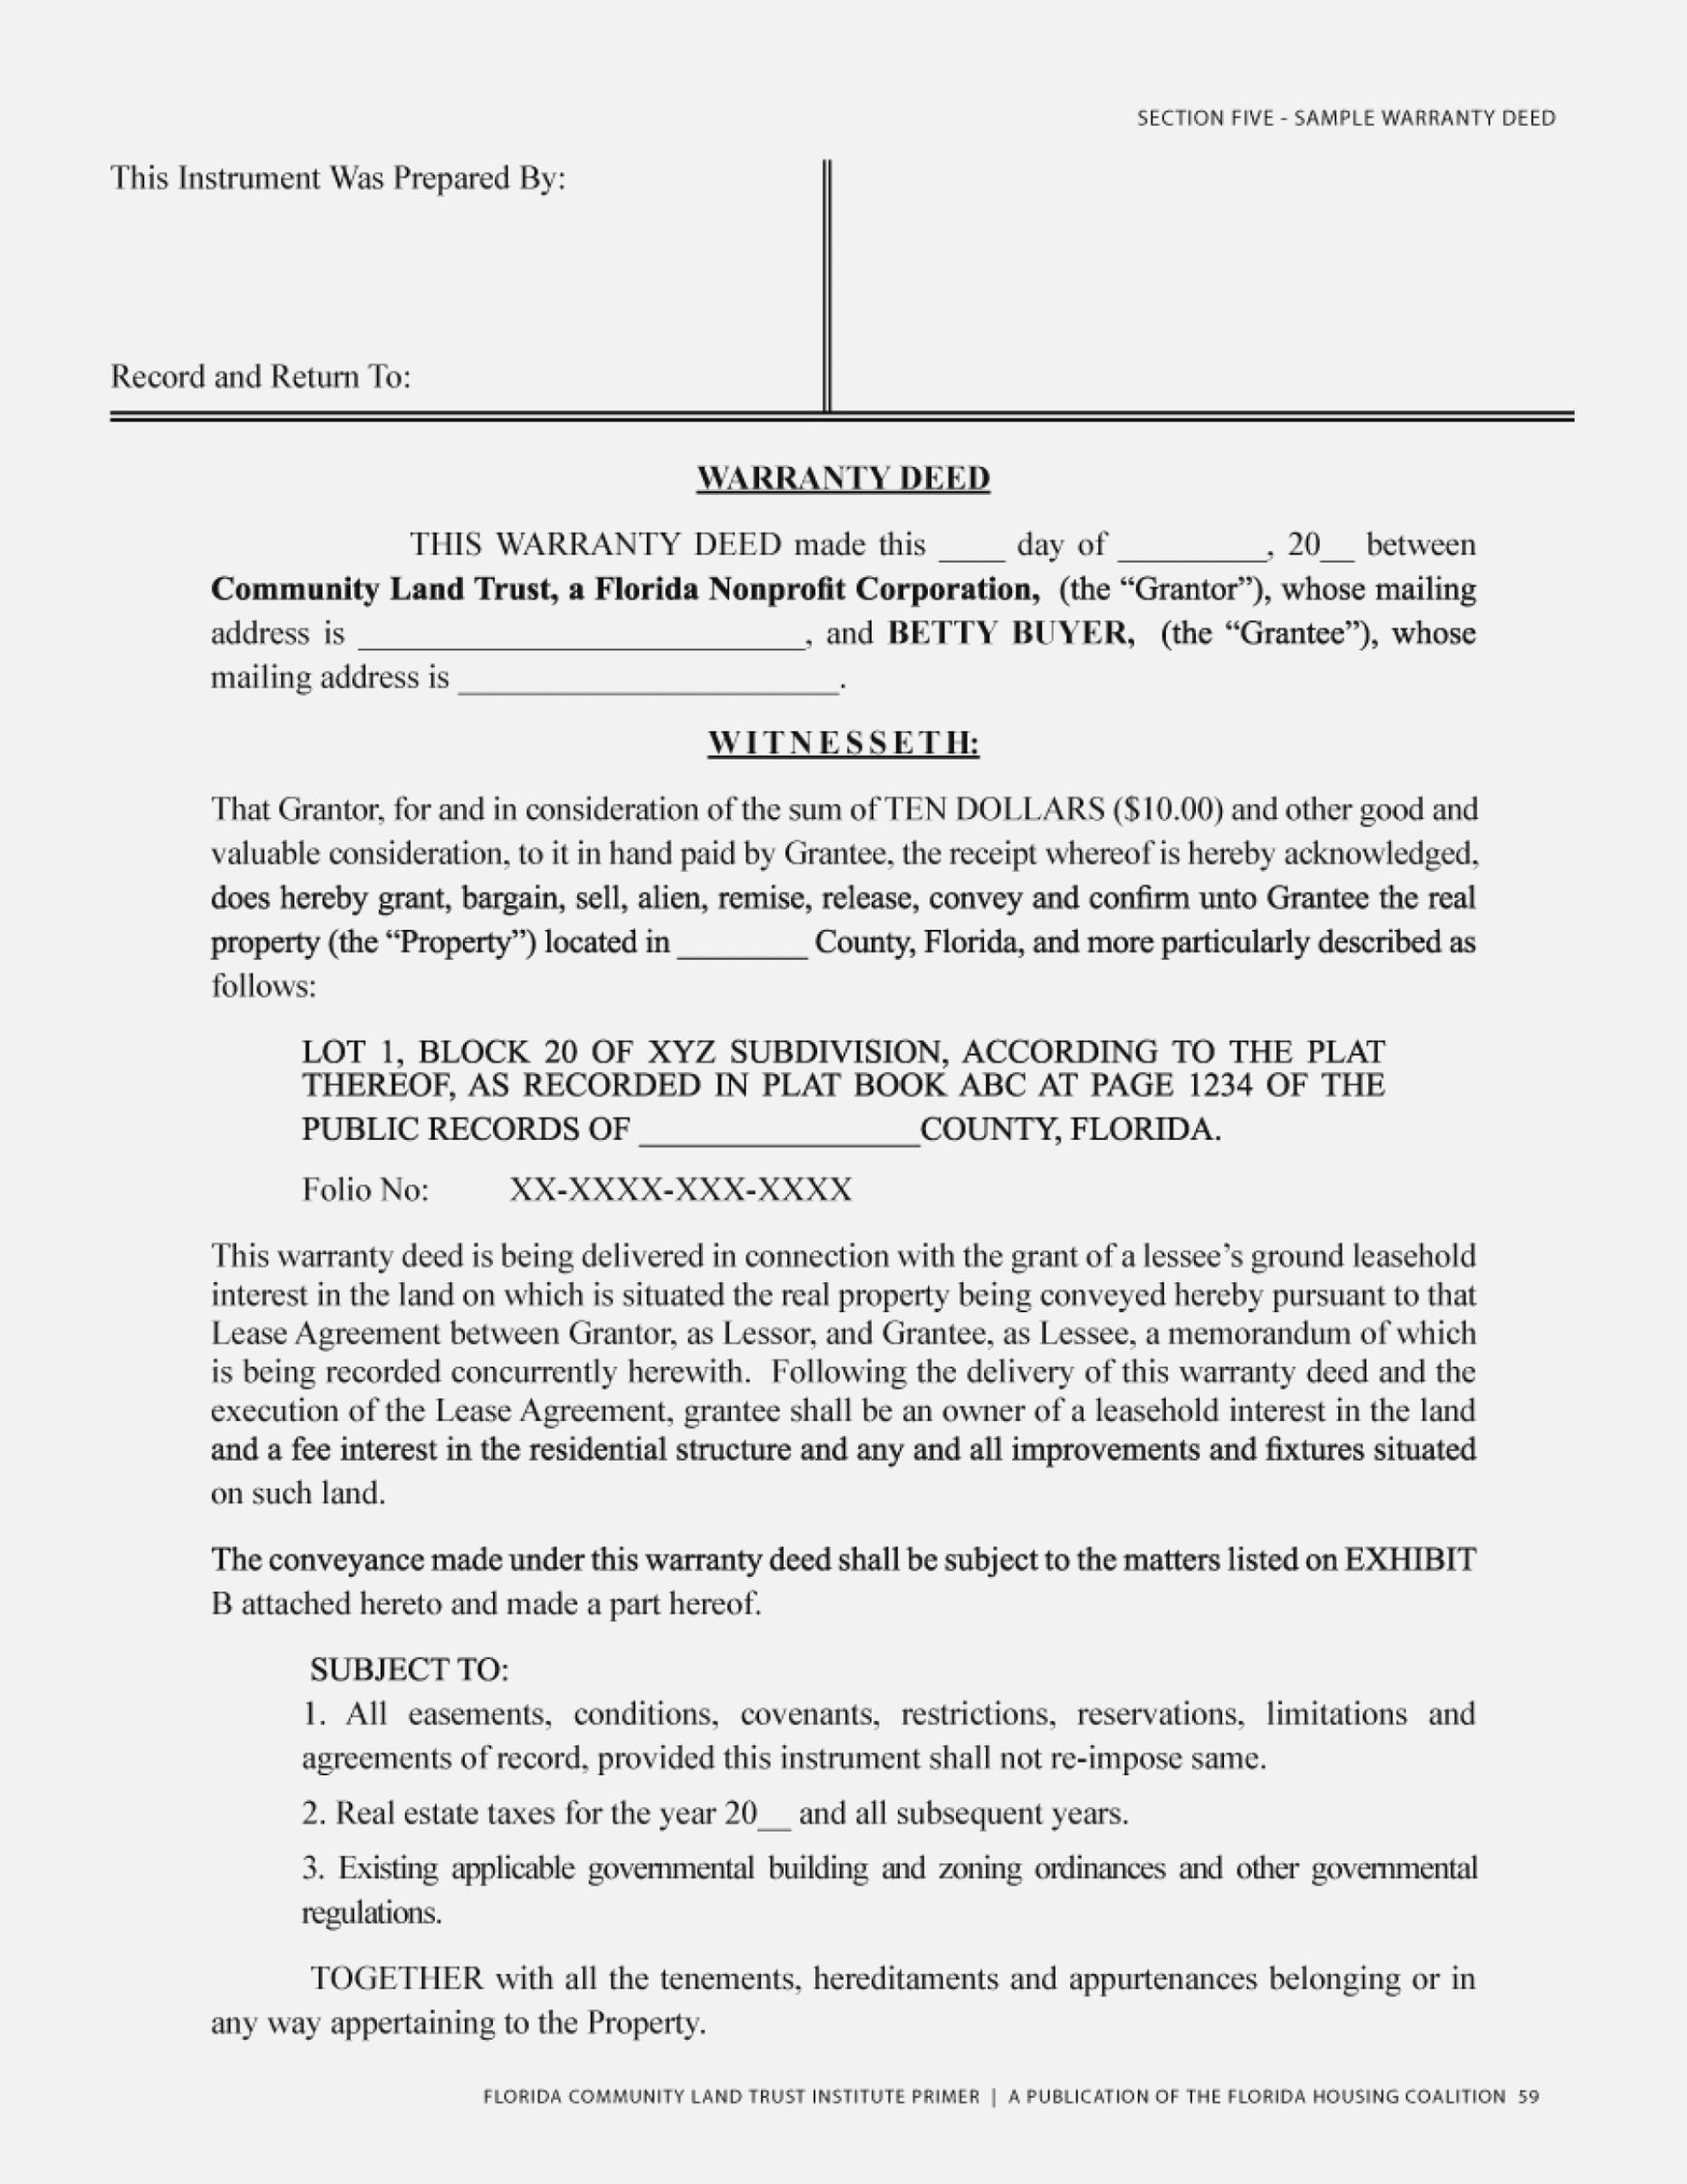 Texas Special Warranty Deed Form Pdf